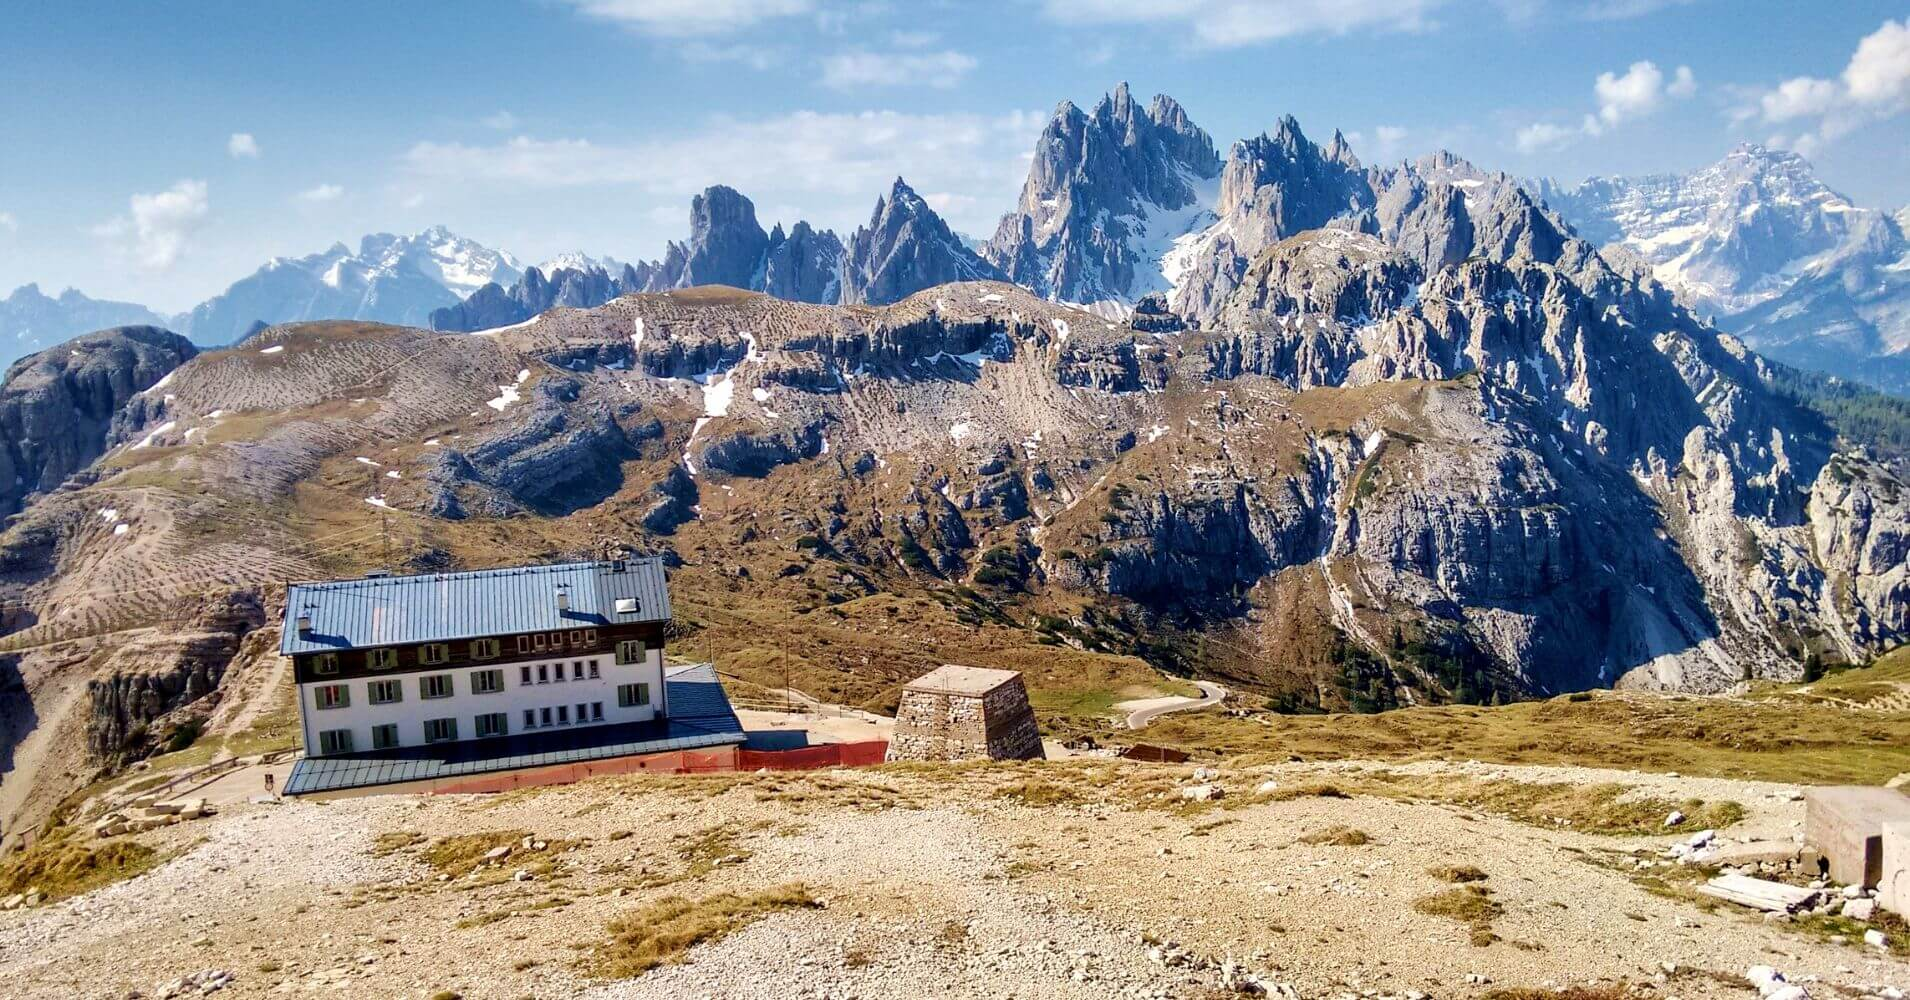 Rifugio Auronzo. Alpes Dolomitas, Tres Cimas di Lavaredo. Belluno, Véneto. Italia.